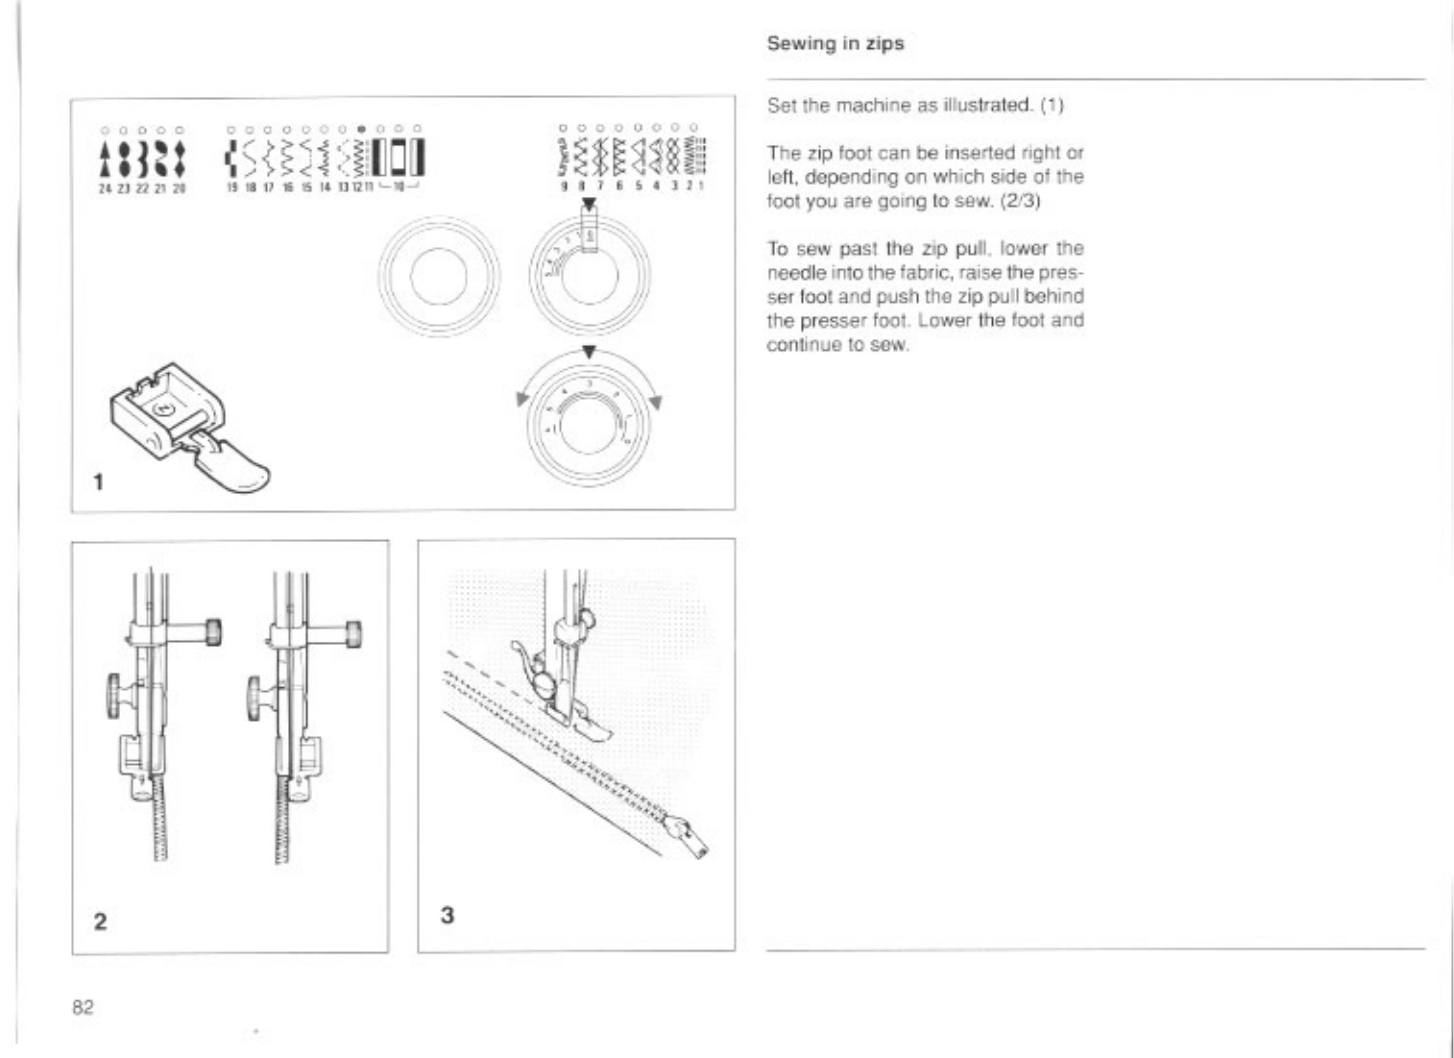 Bernina 715 Users Manual Bernette_715_730_740E